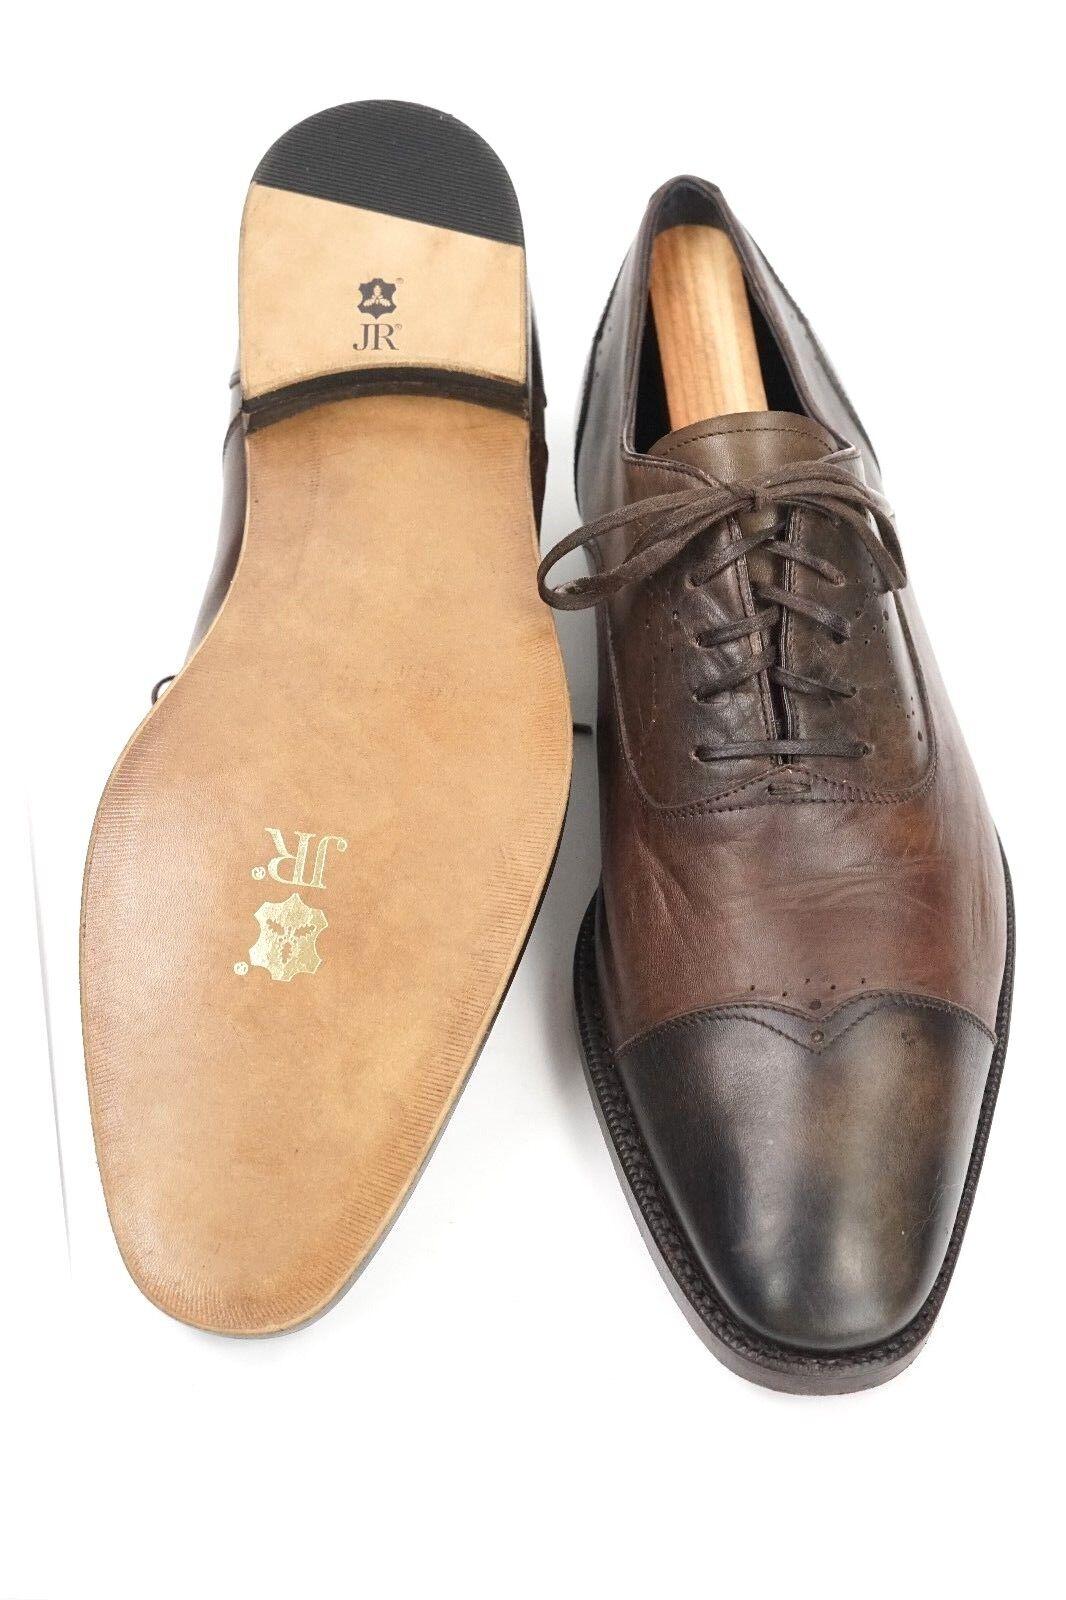 695 Ermenegildo Zegna Mens Restored   Resoled Leather Cap Toe shoes US Size 8M